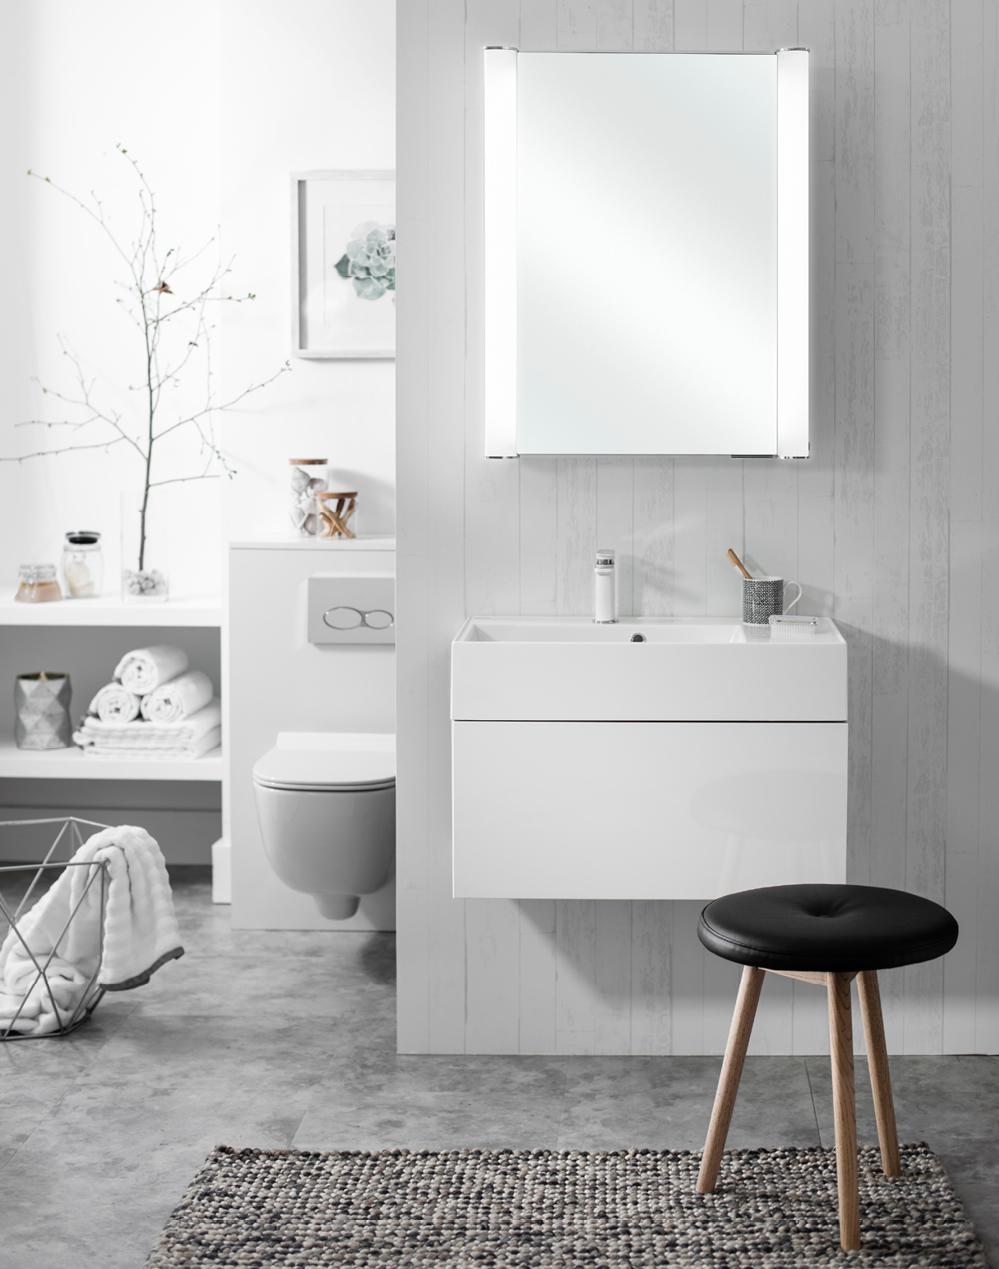 Bauhaus Bathroom Furniture Photography